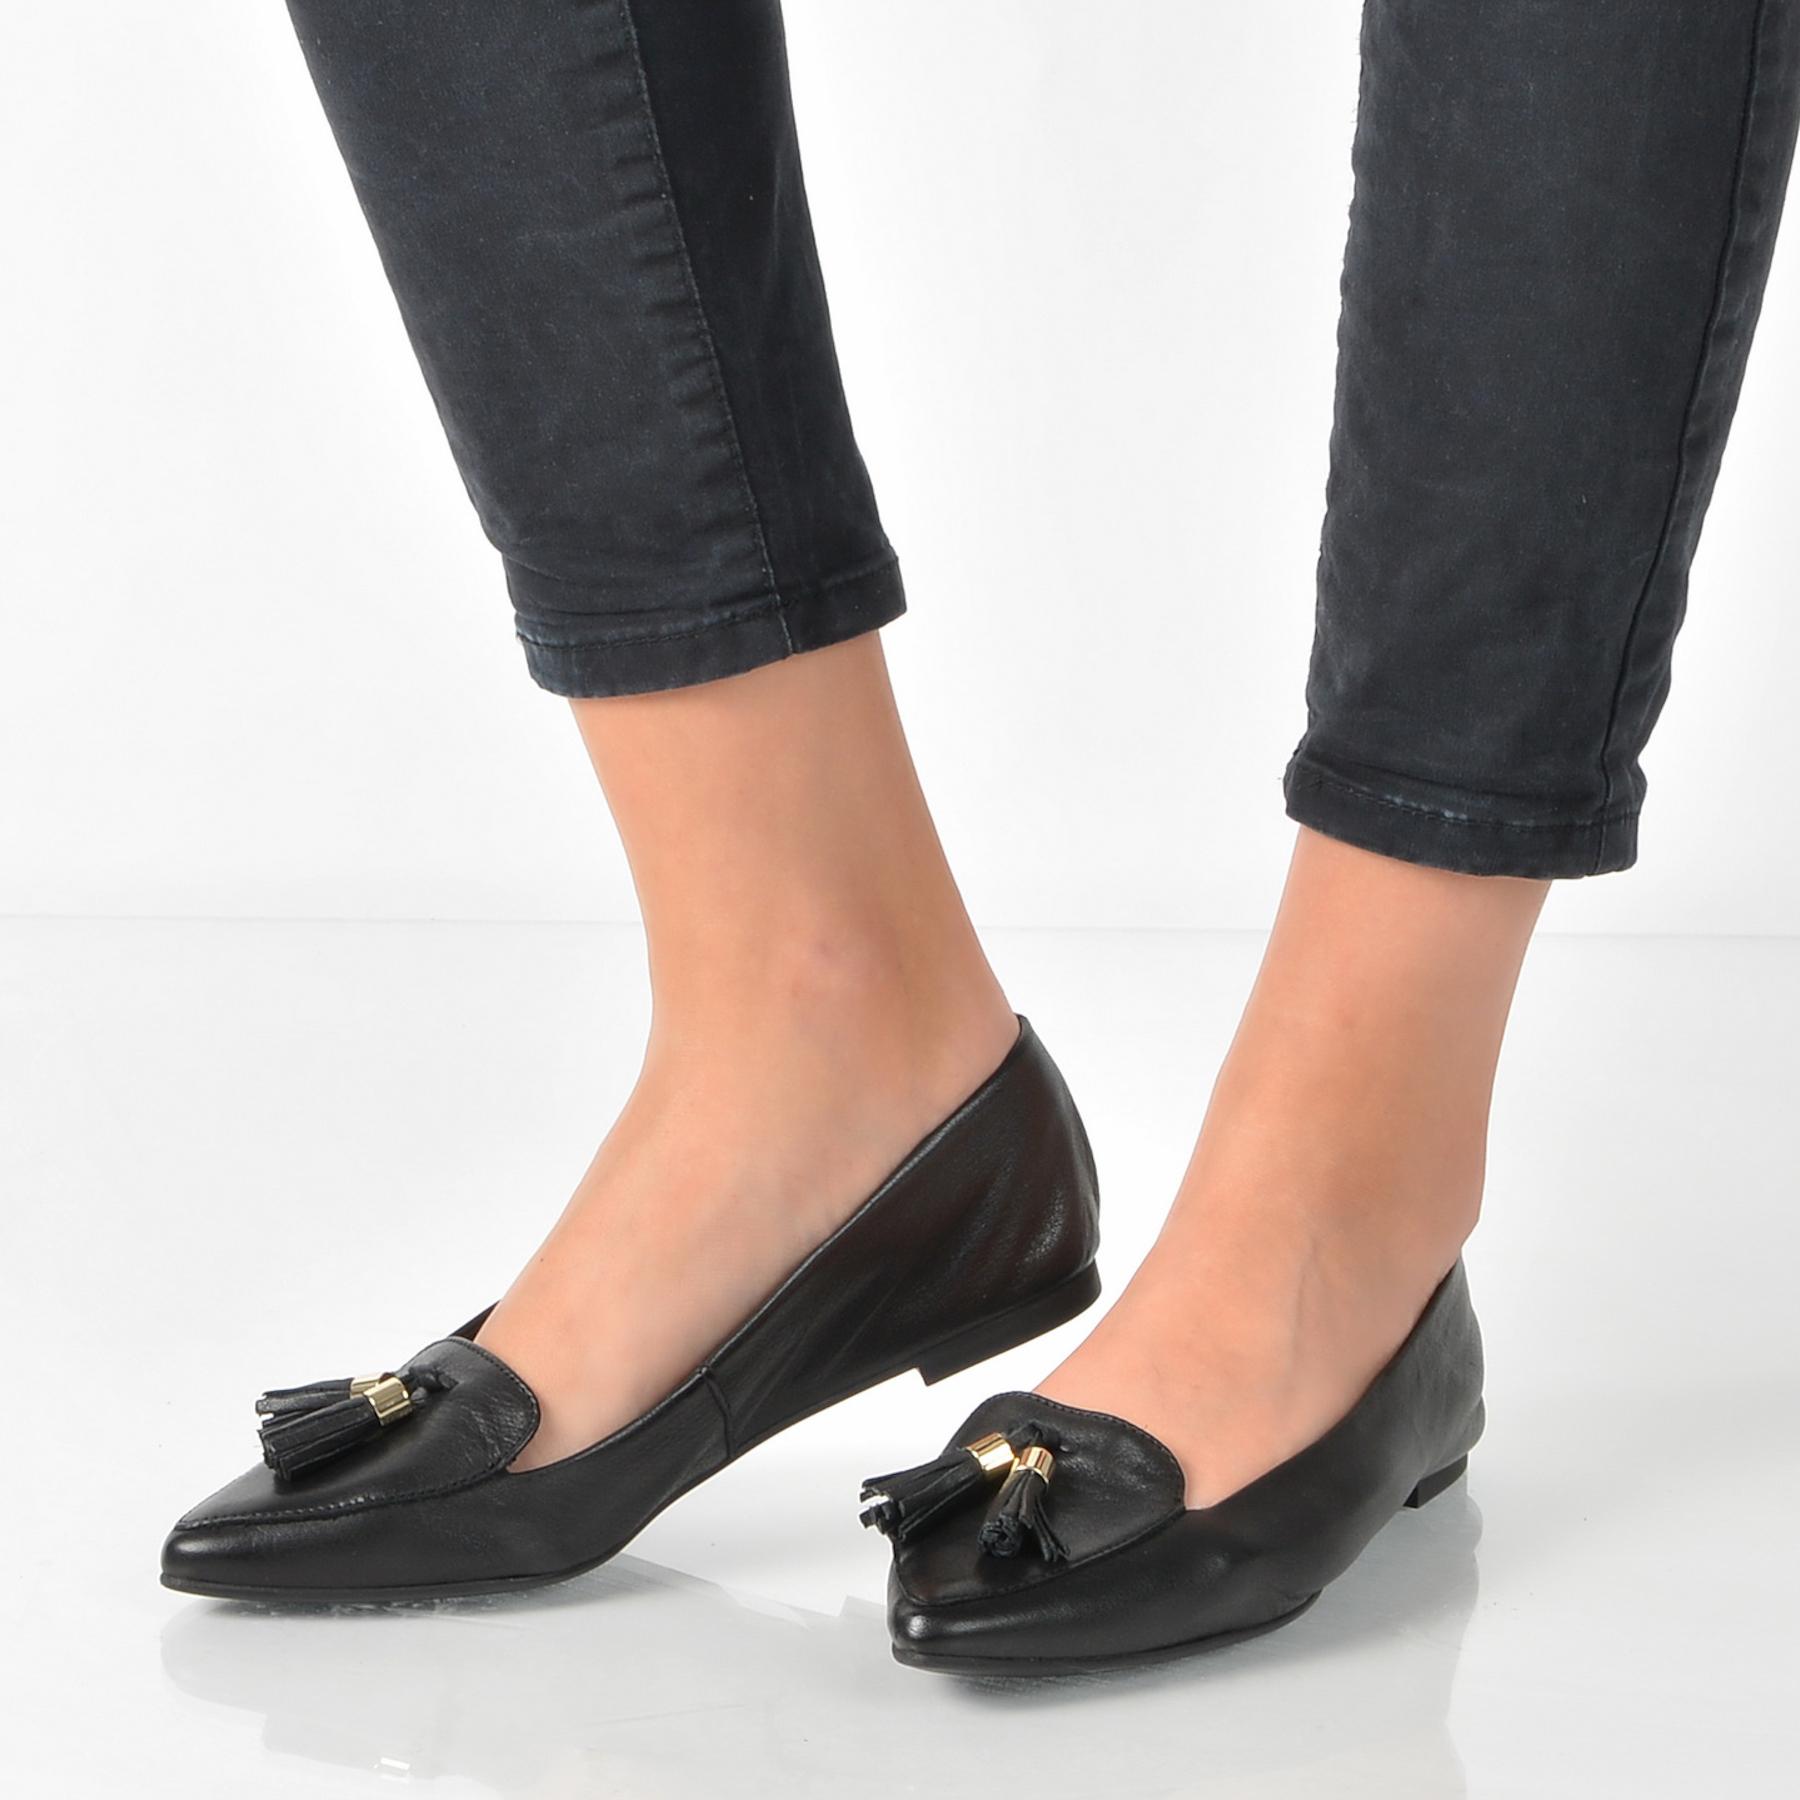 Pantofi Aldo Negri, Magona, Din Piele Naturala